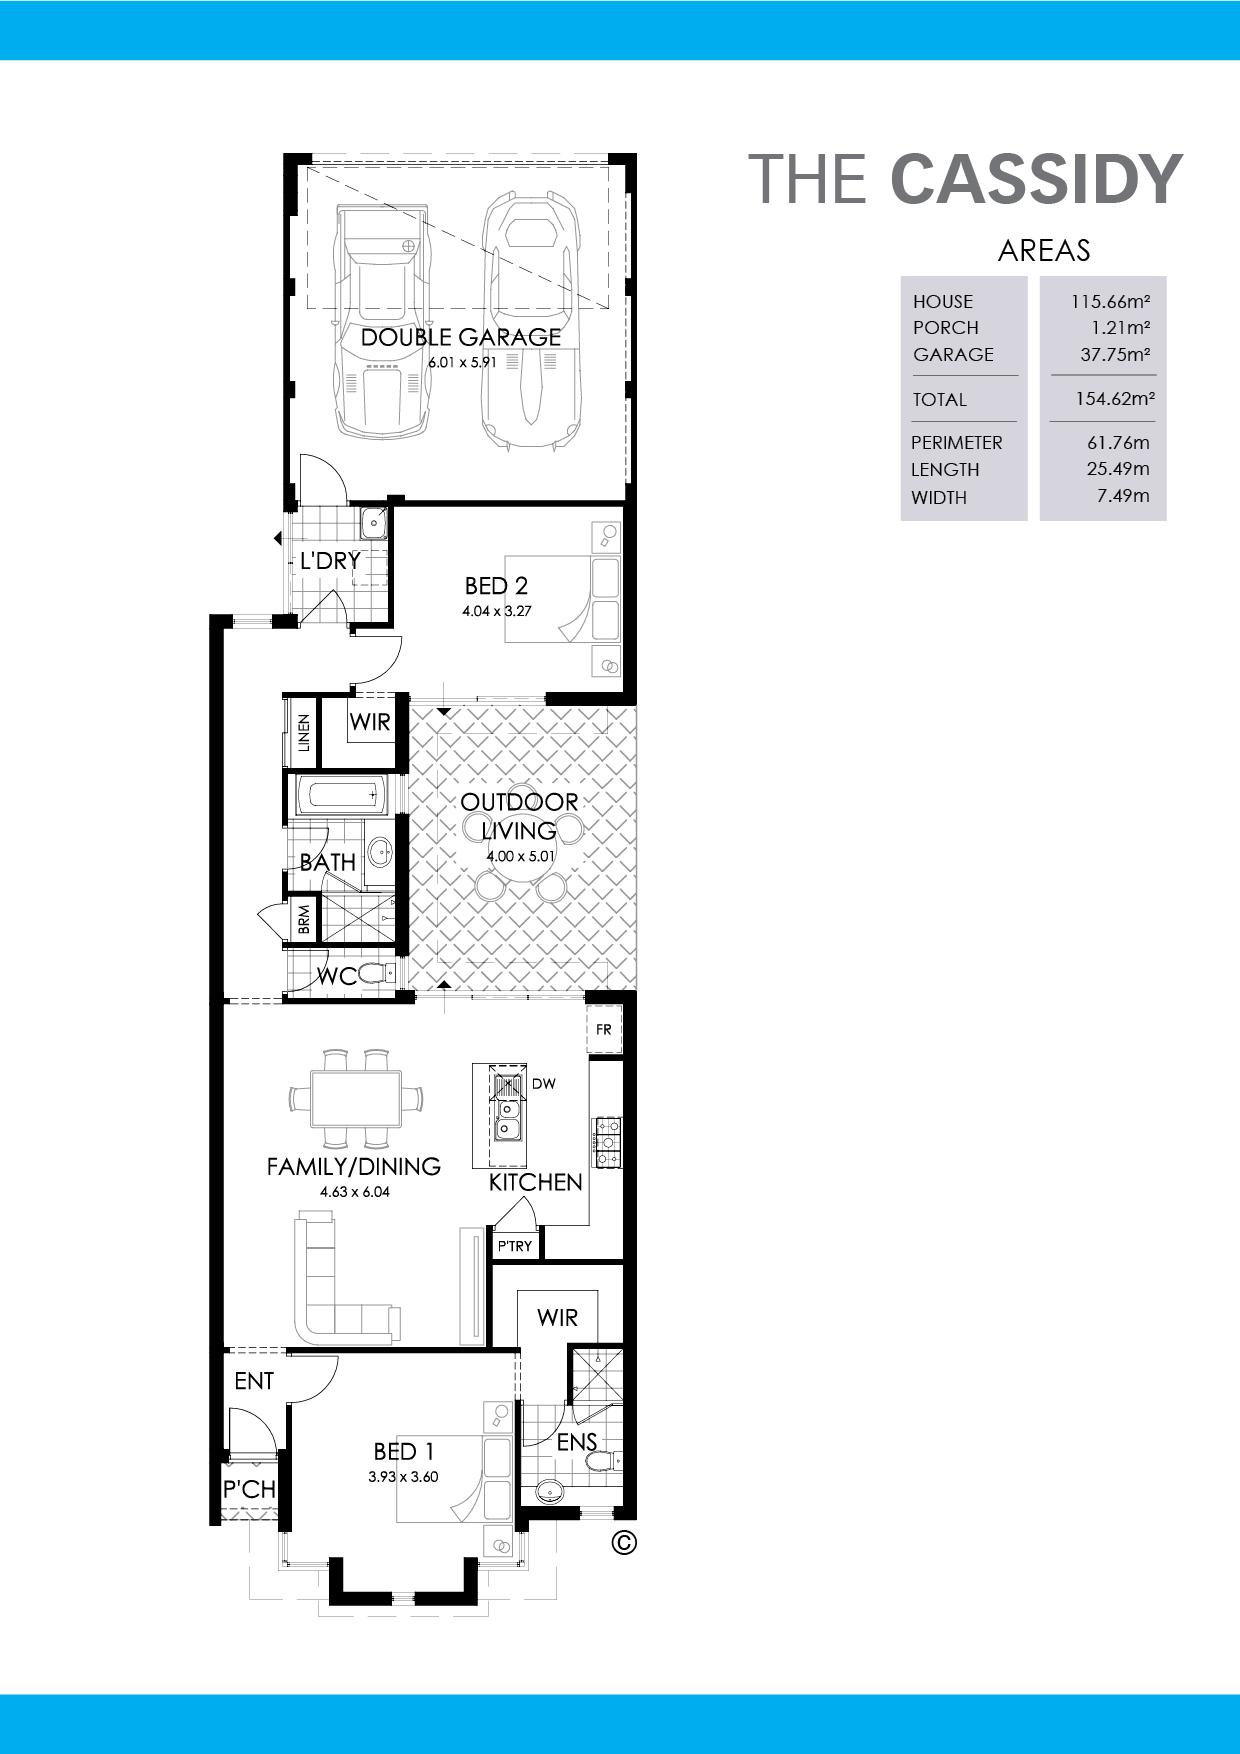 The Cassidy Floorplan